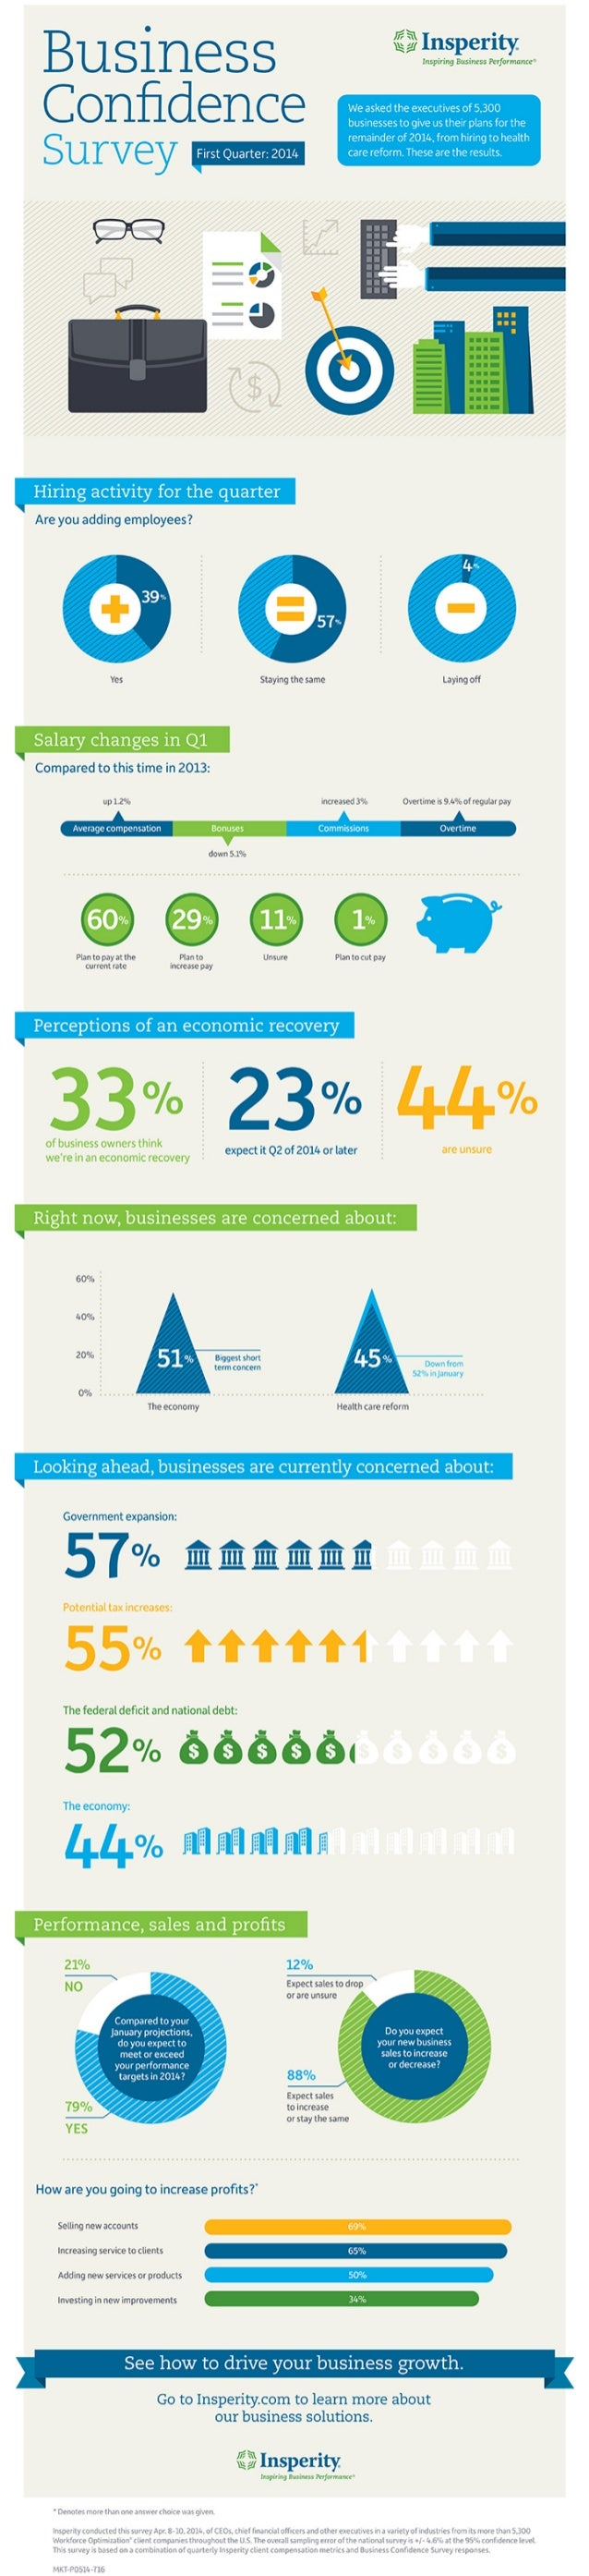 Insperity Business Confidence Survey: Q1 2014 [Infographic]